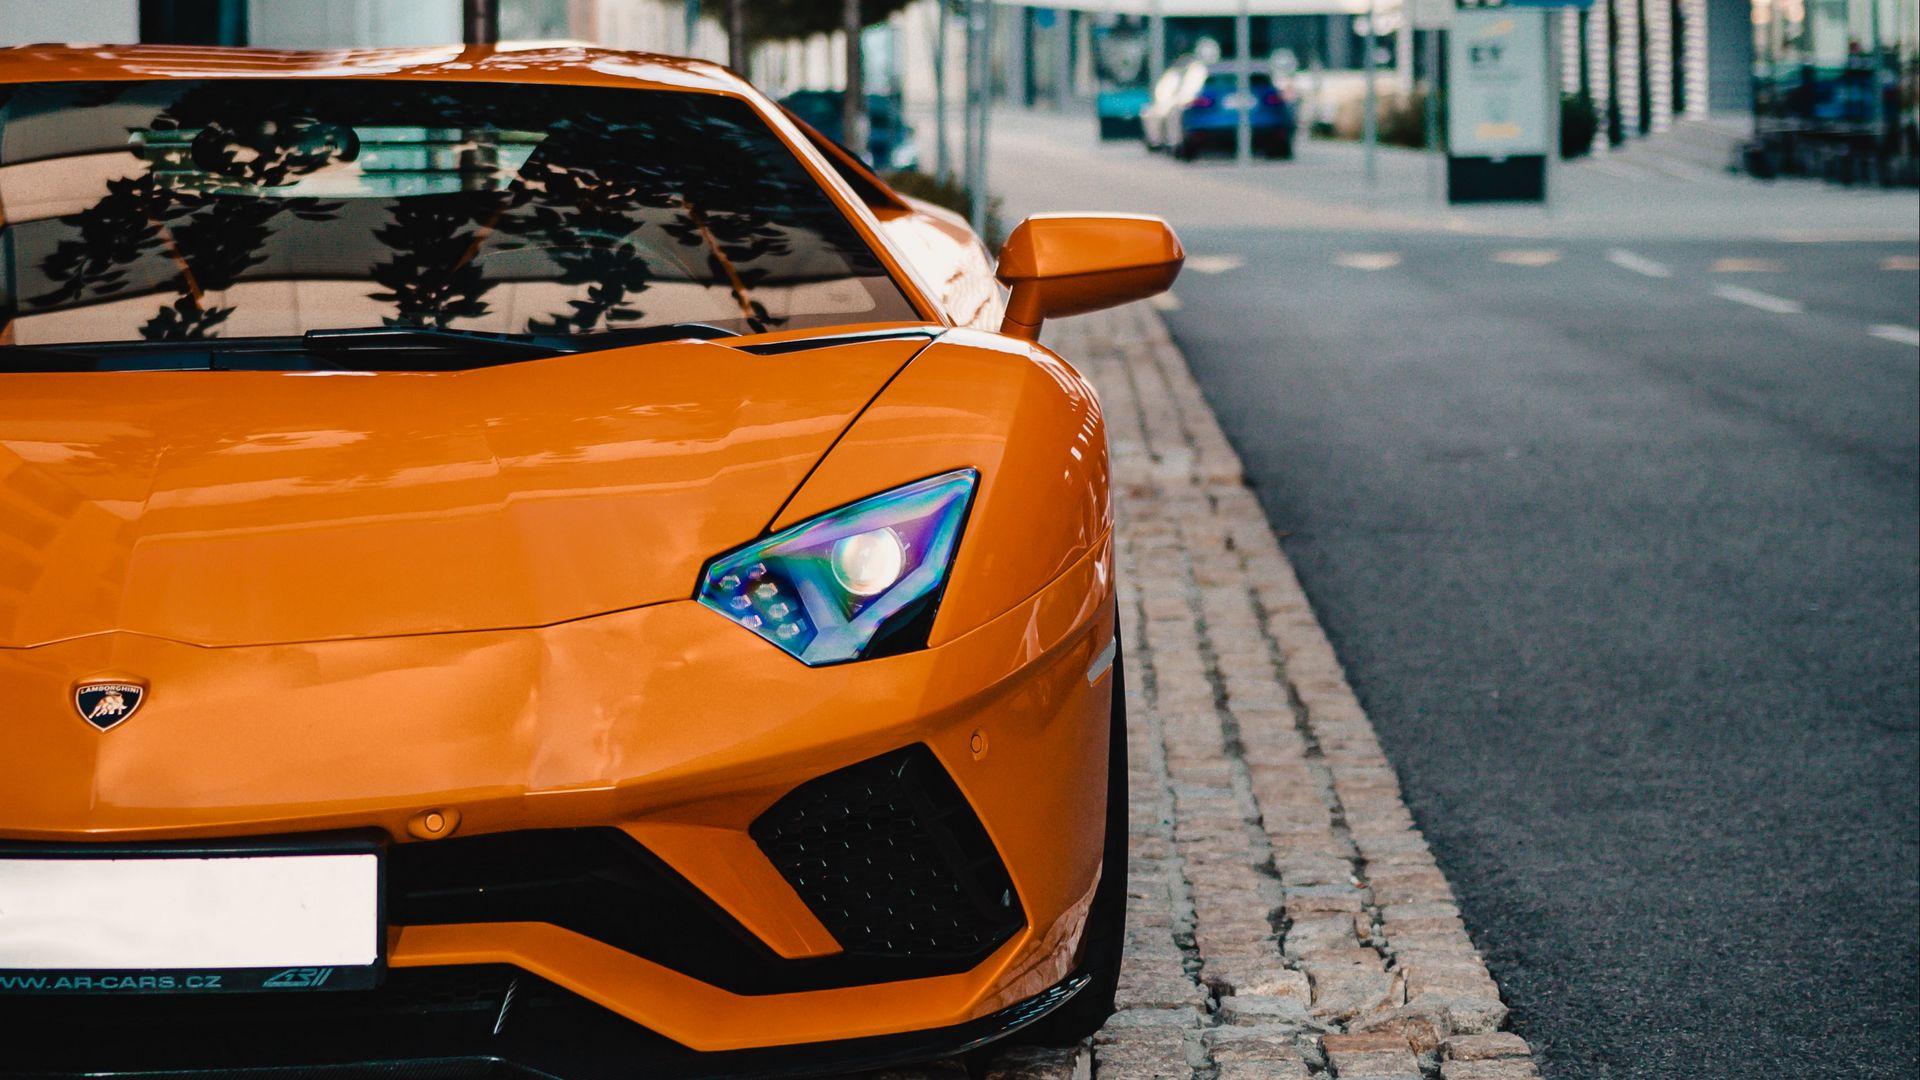 The Best Wallpapers Related to Lamborghini Aventador, Lamborghini, Sportscar (1)